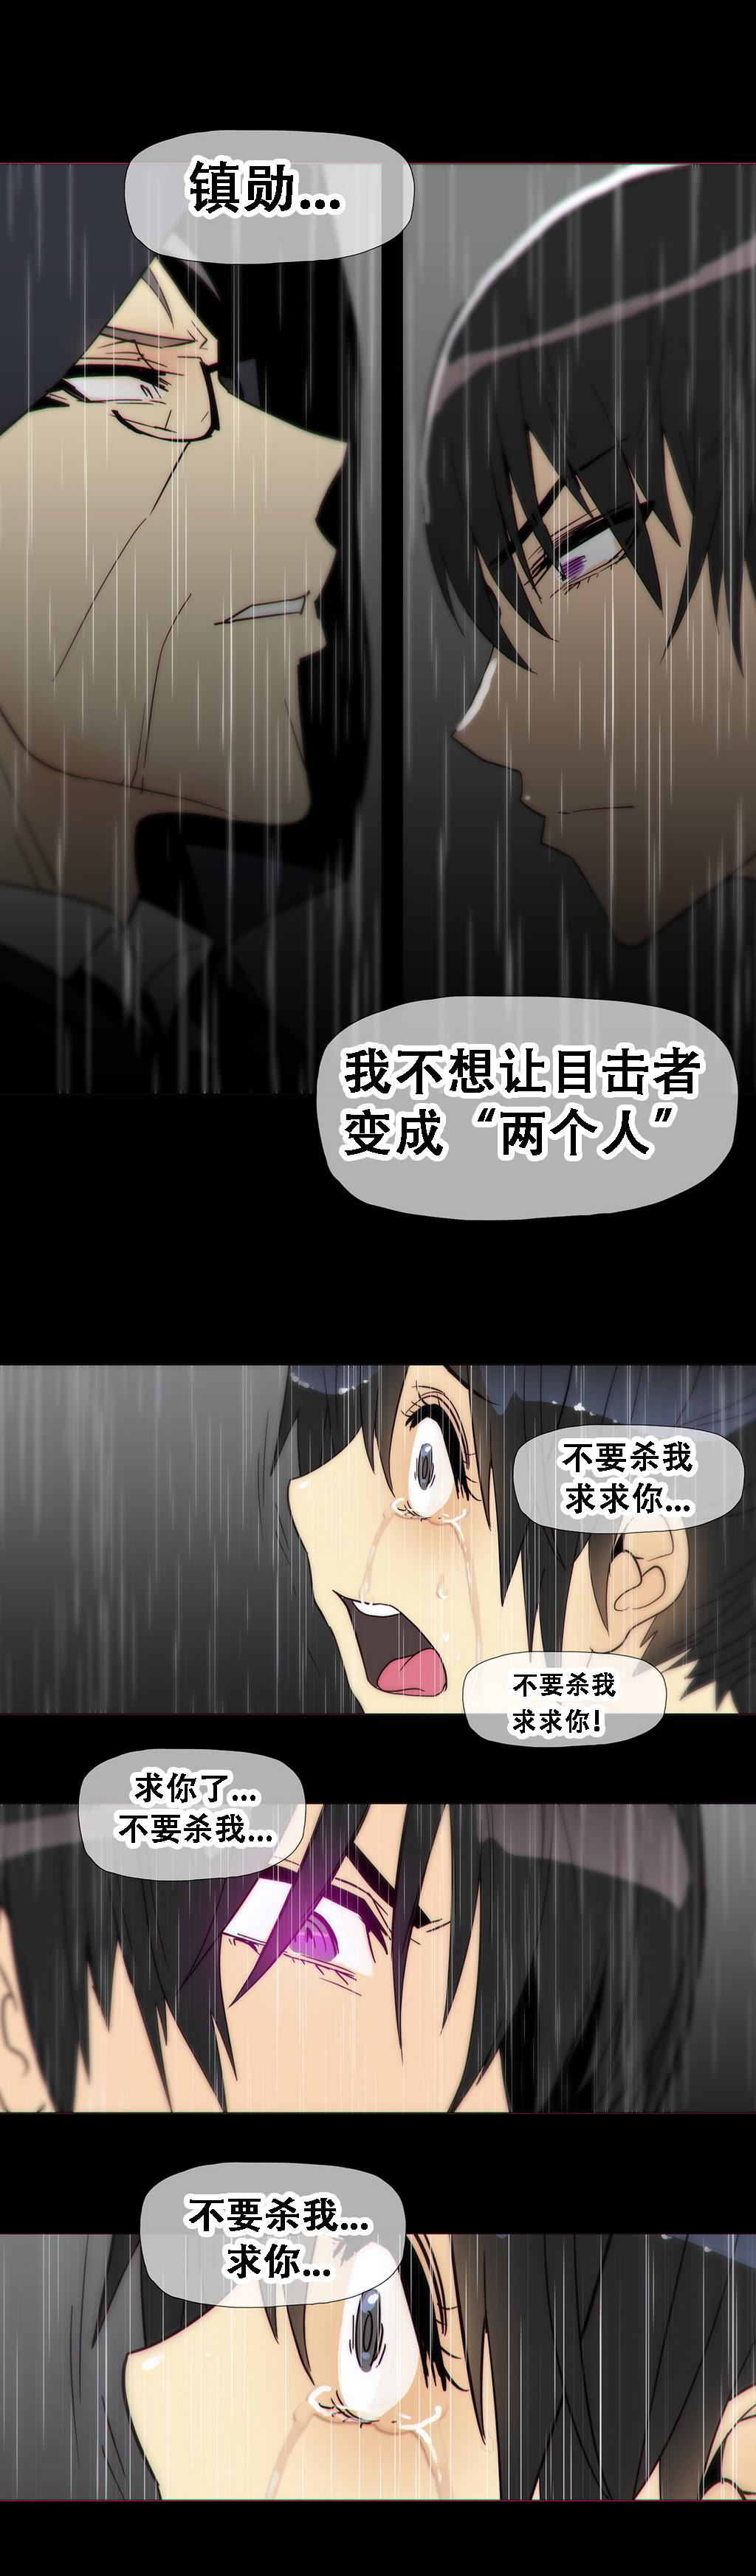 HouseHold Affairs 【卞赤鲤个人汉化】1~21话(持续更新中) 336